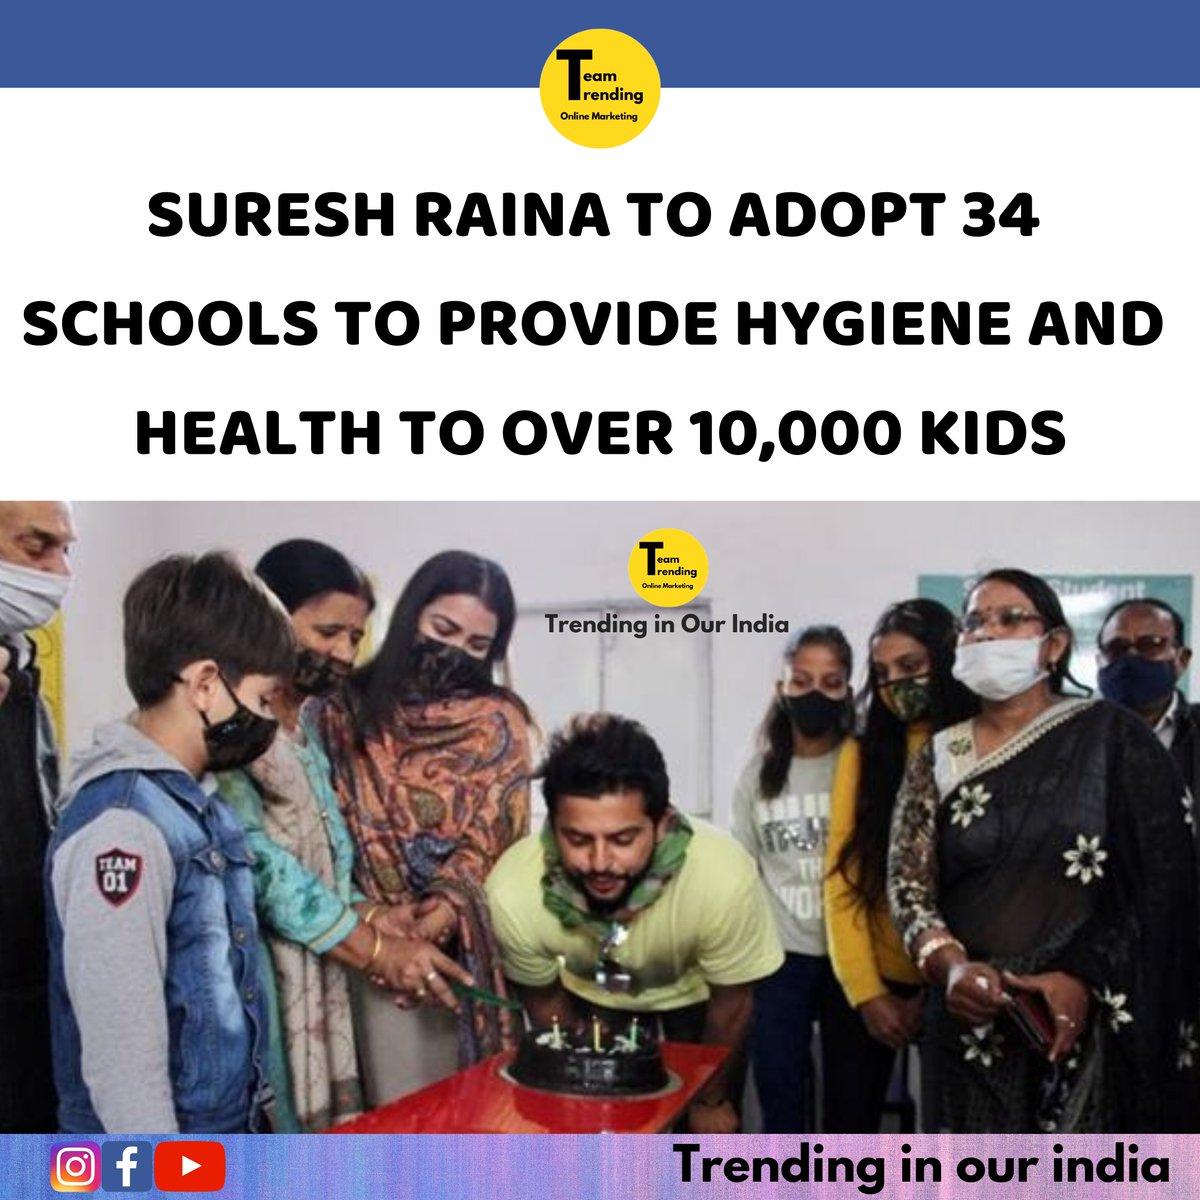 Former Indian cricketer @ImRaina has decided to adopt 34 government schools.   Read more -  • • • • #sureshraina #raina #rainaiscrazy #sureshrainaclub #sureshrainafc #cricket #cricketer #indian #india #indiancricket #indiancricketer #trendinginourindia